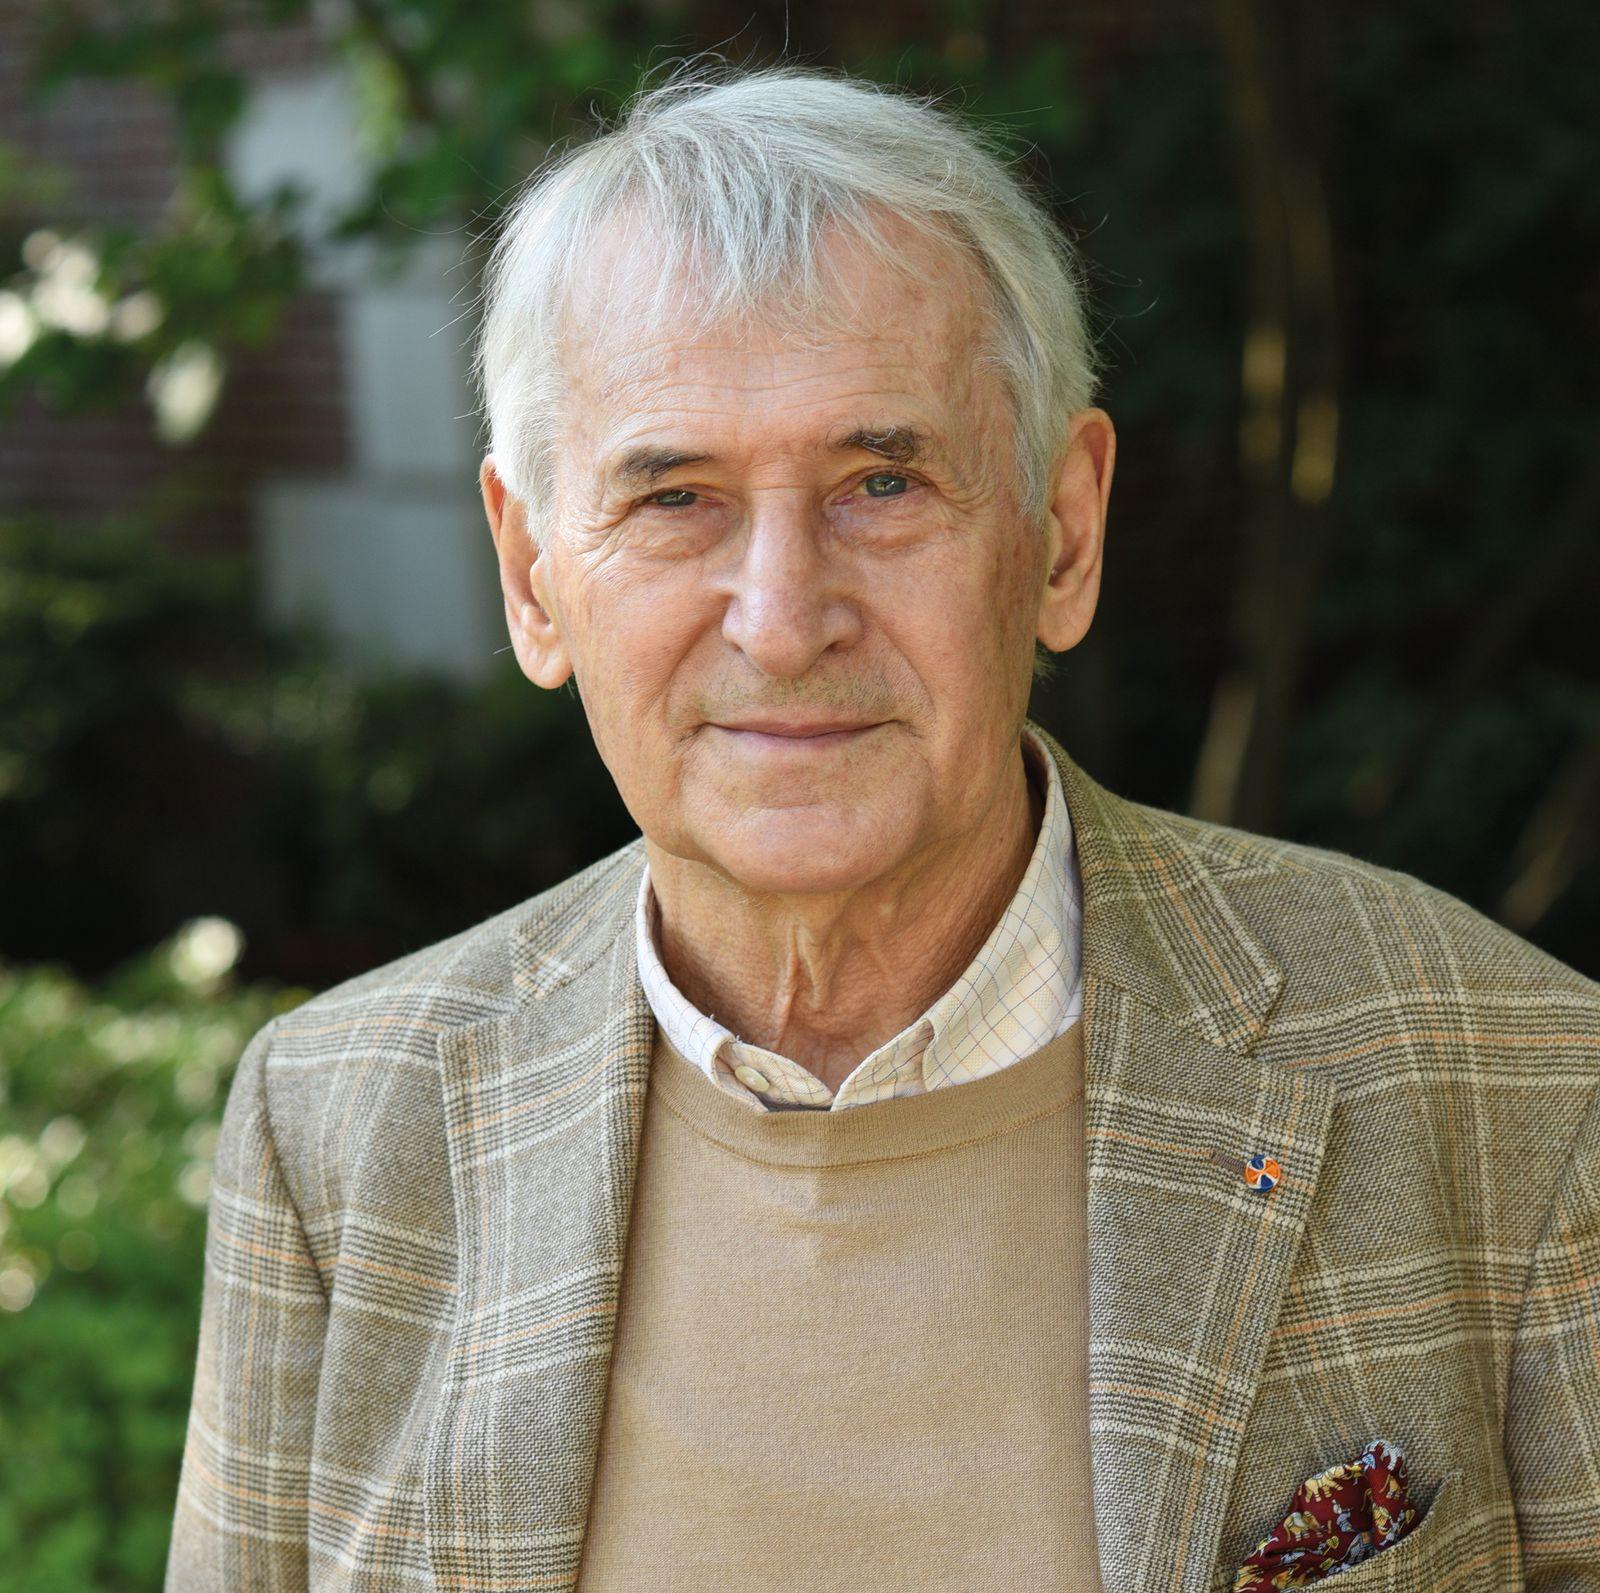 Manfred Kets de Vries